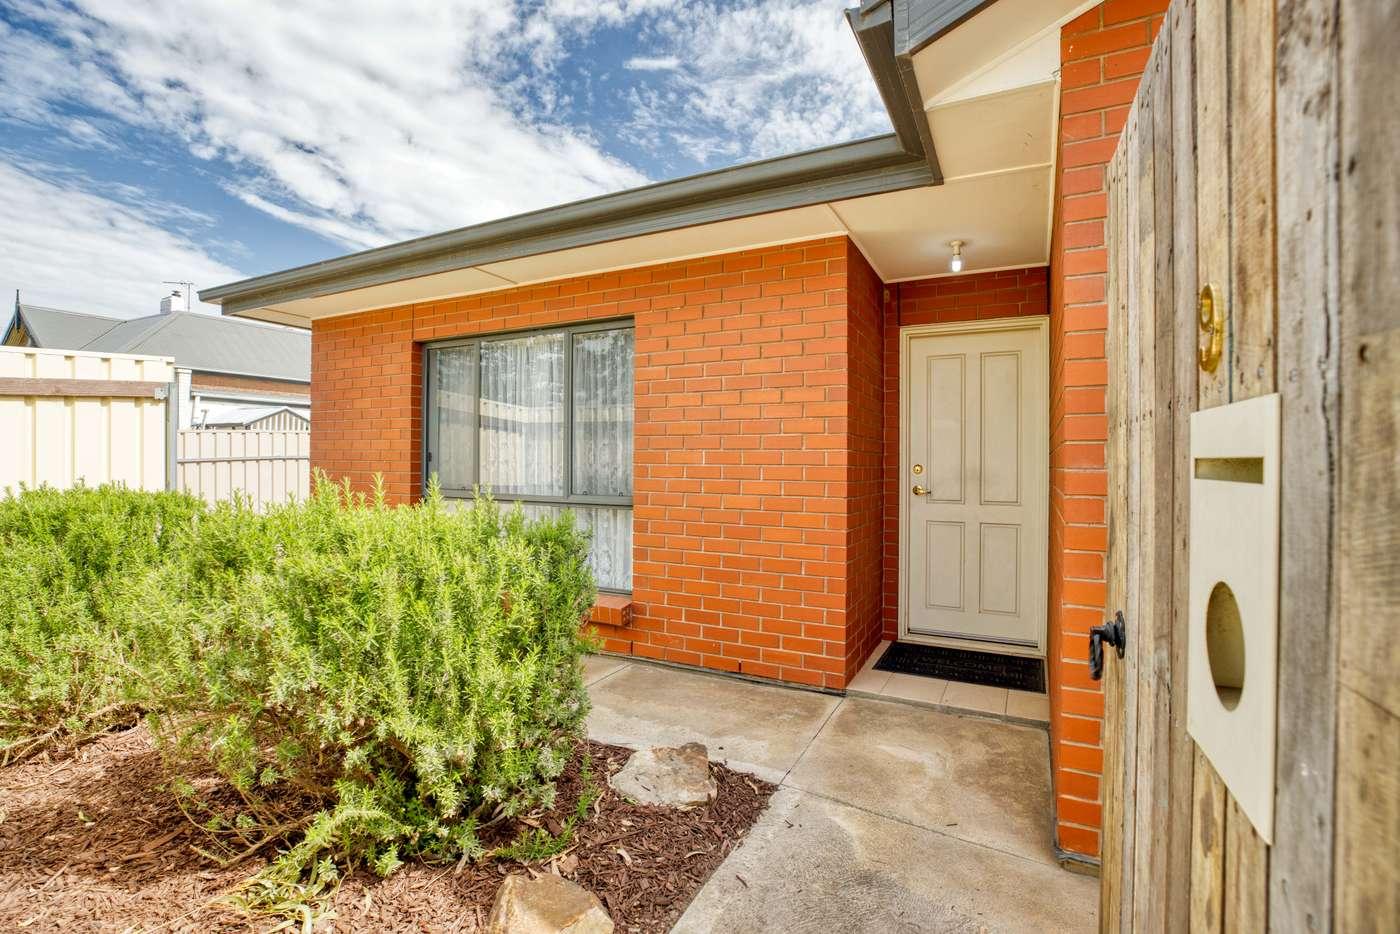 Main view of Homely house listing, 9 Dickenson Close, Birkenhead SA 5015